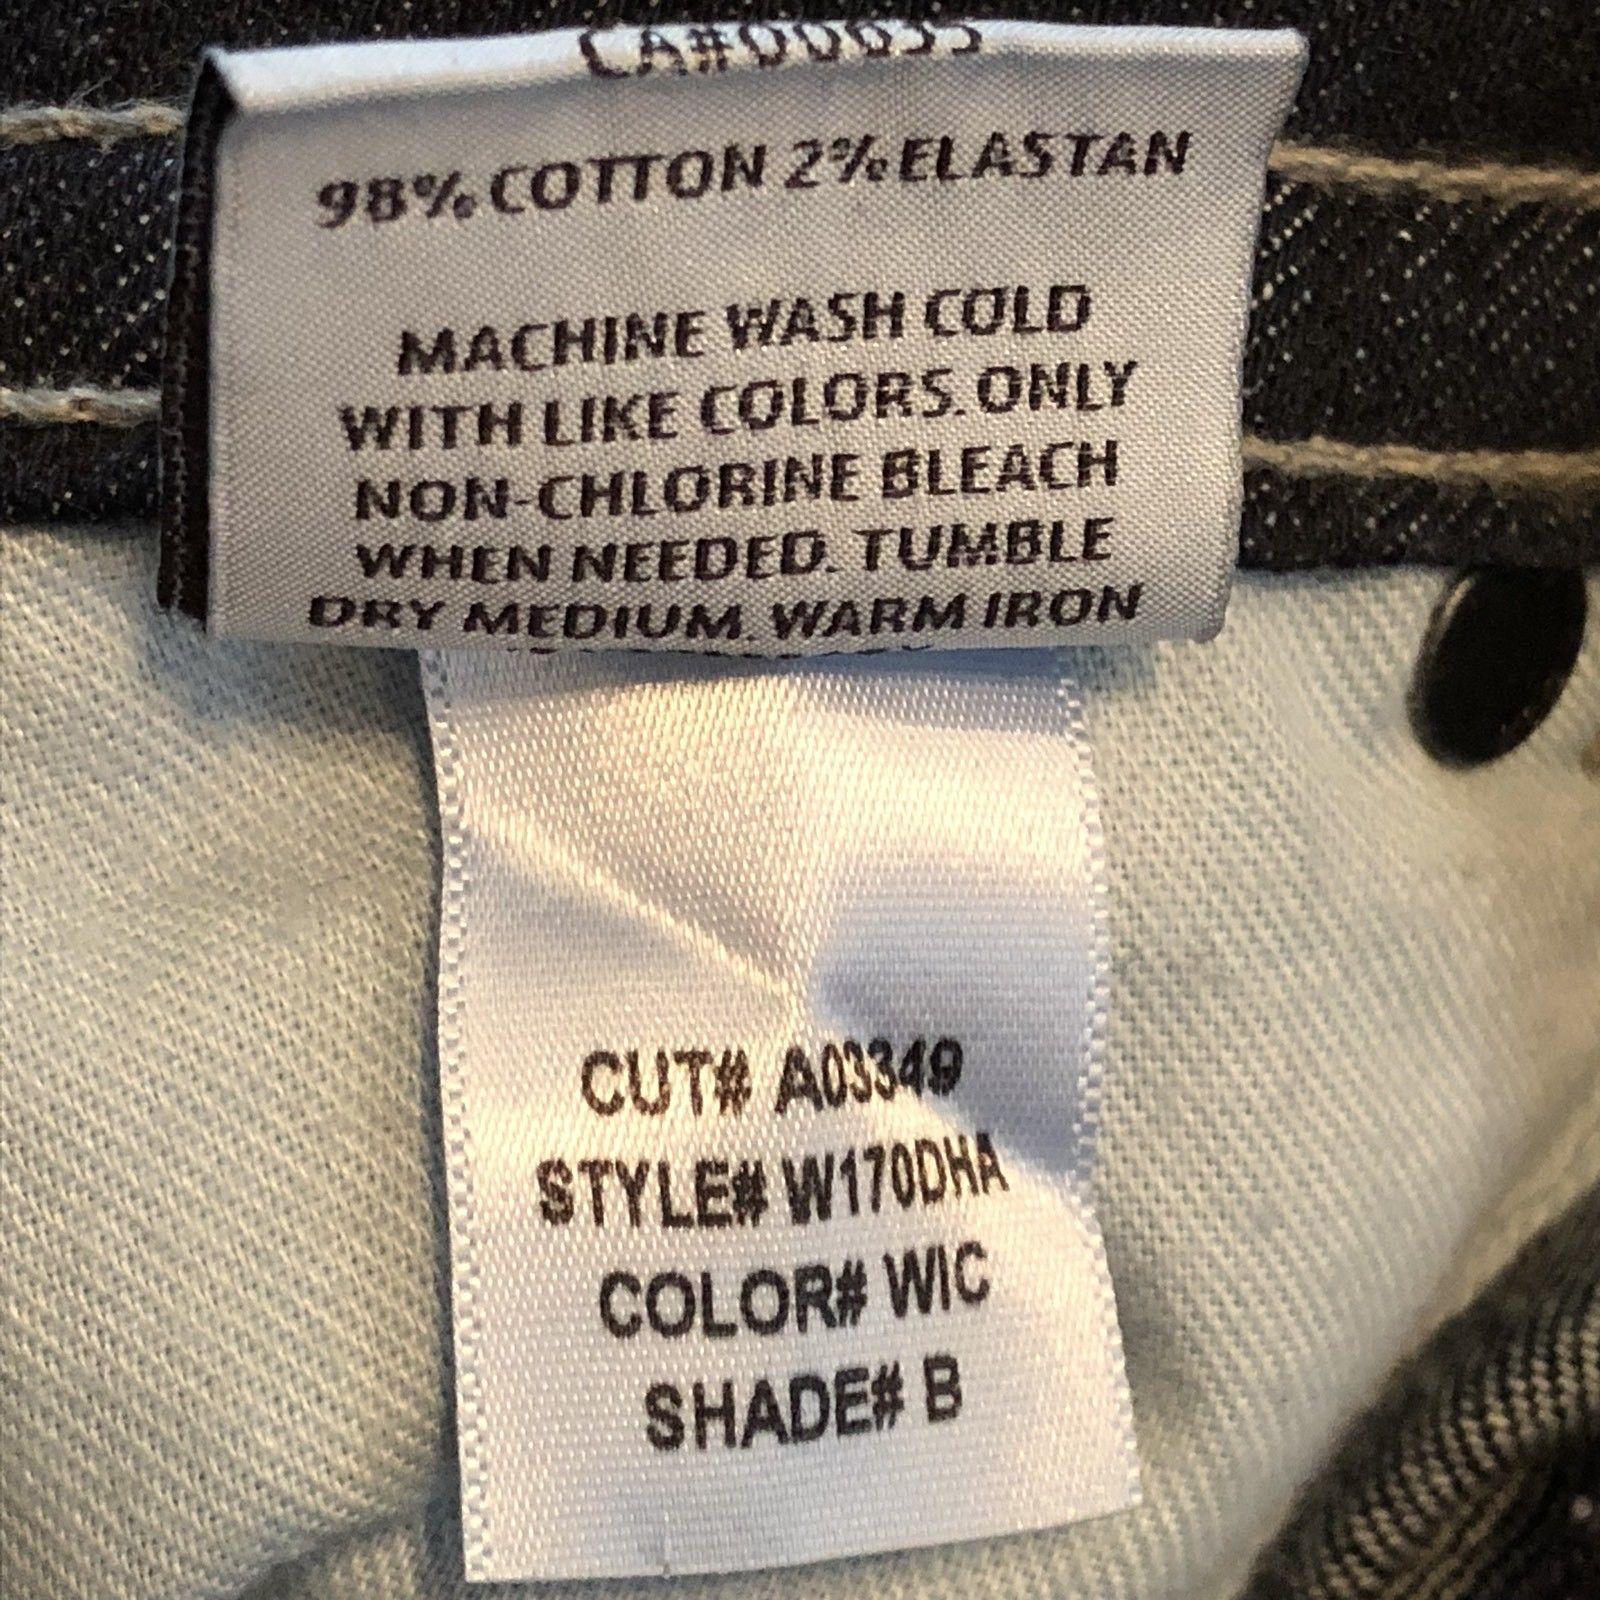 Hudson Jeans Signature Boot Cut Style #W170DHA Color NAN Dark Women's Size 26